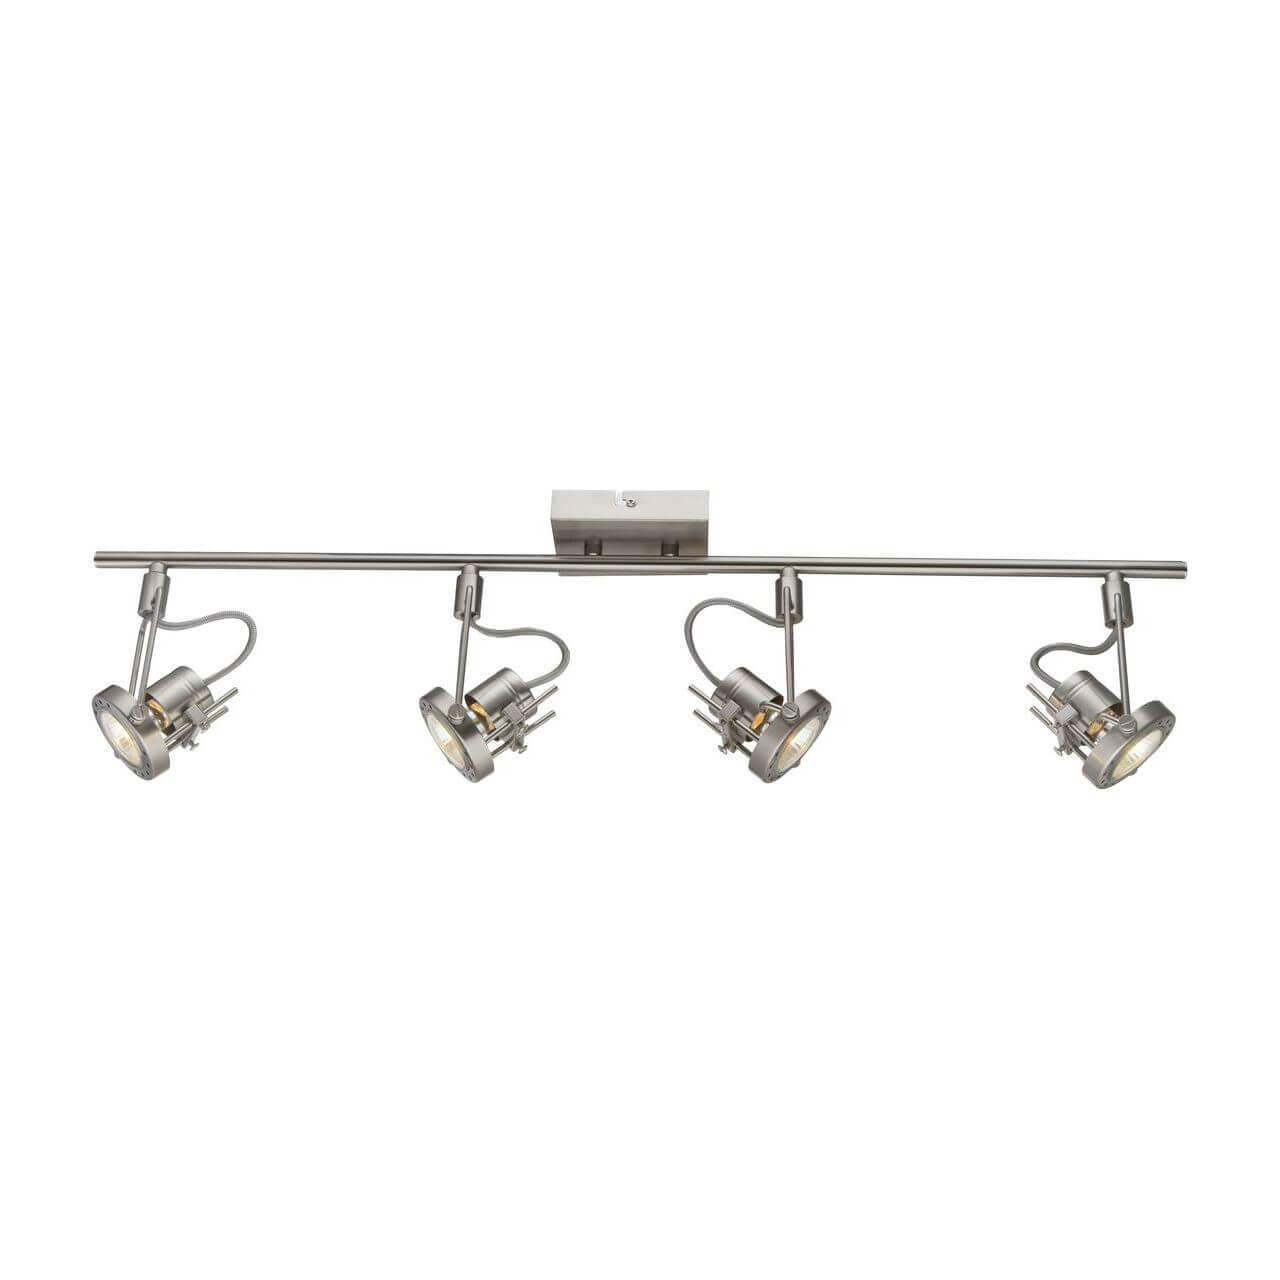 Спот Arte Lamp A4301PL-4SS 4301 недорого